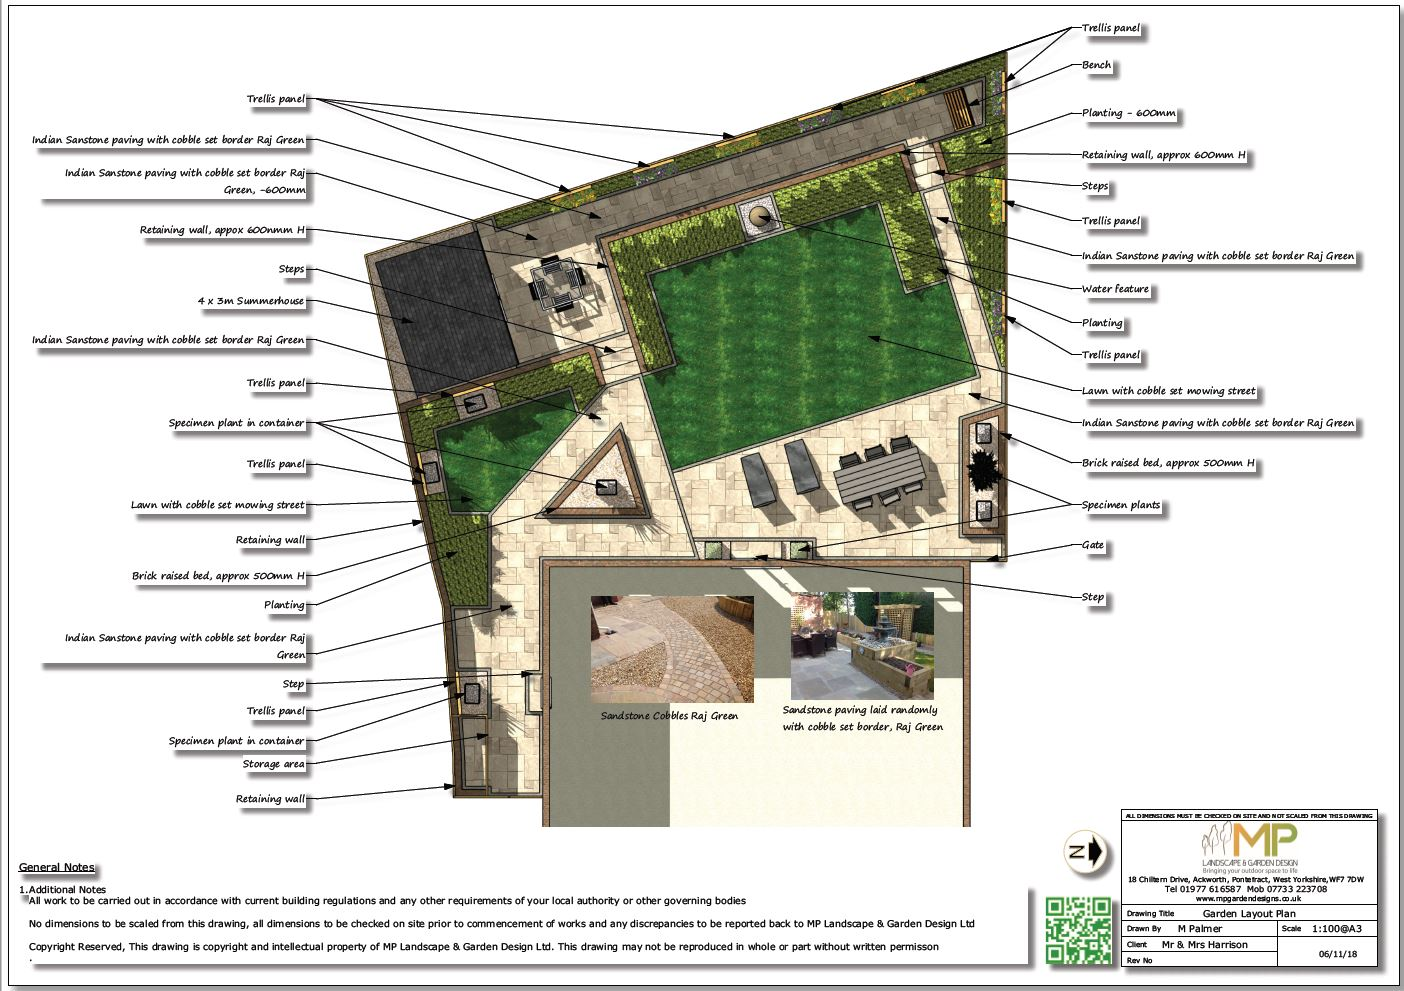 Colour garden design layout plan for a rear garden in Wistow, North Yorshire.